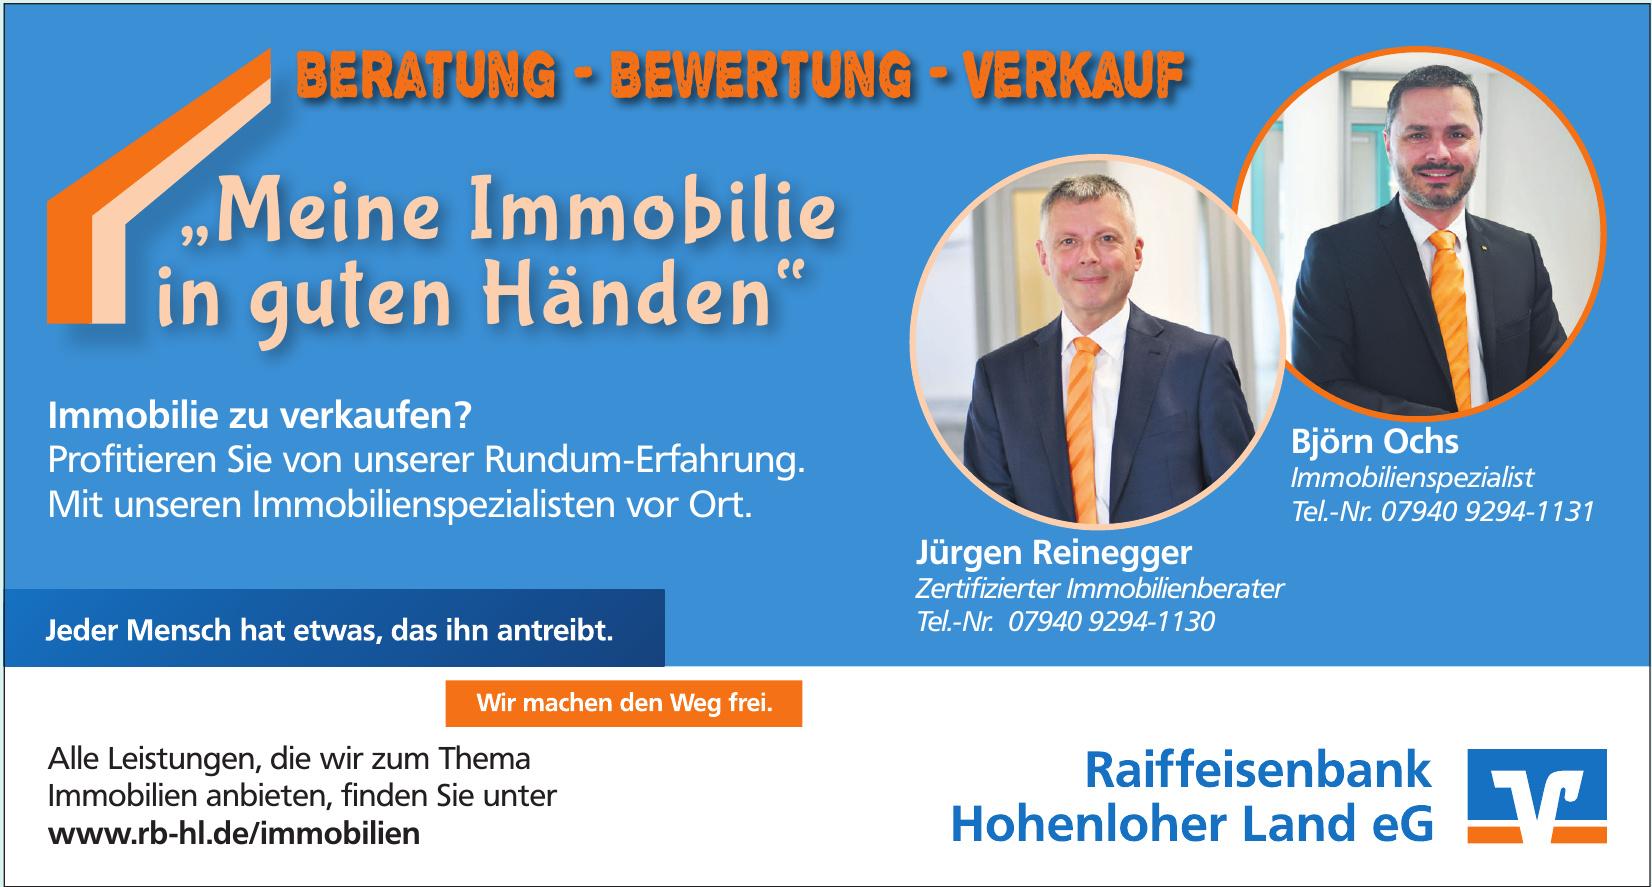 Raiffeisenbank Hohenloher Land eG